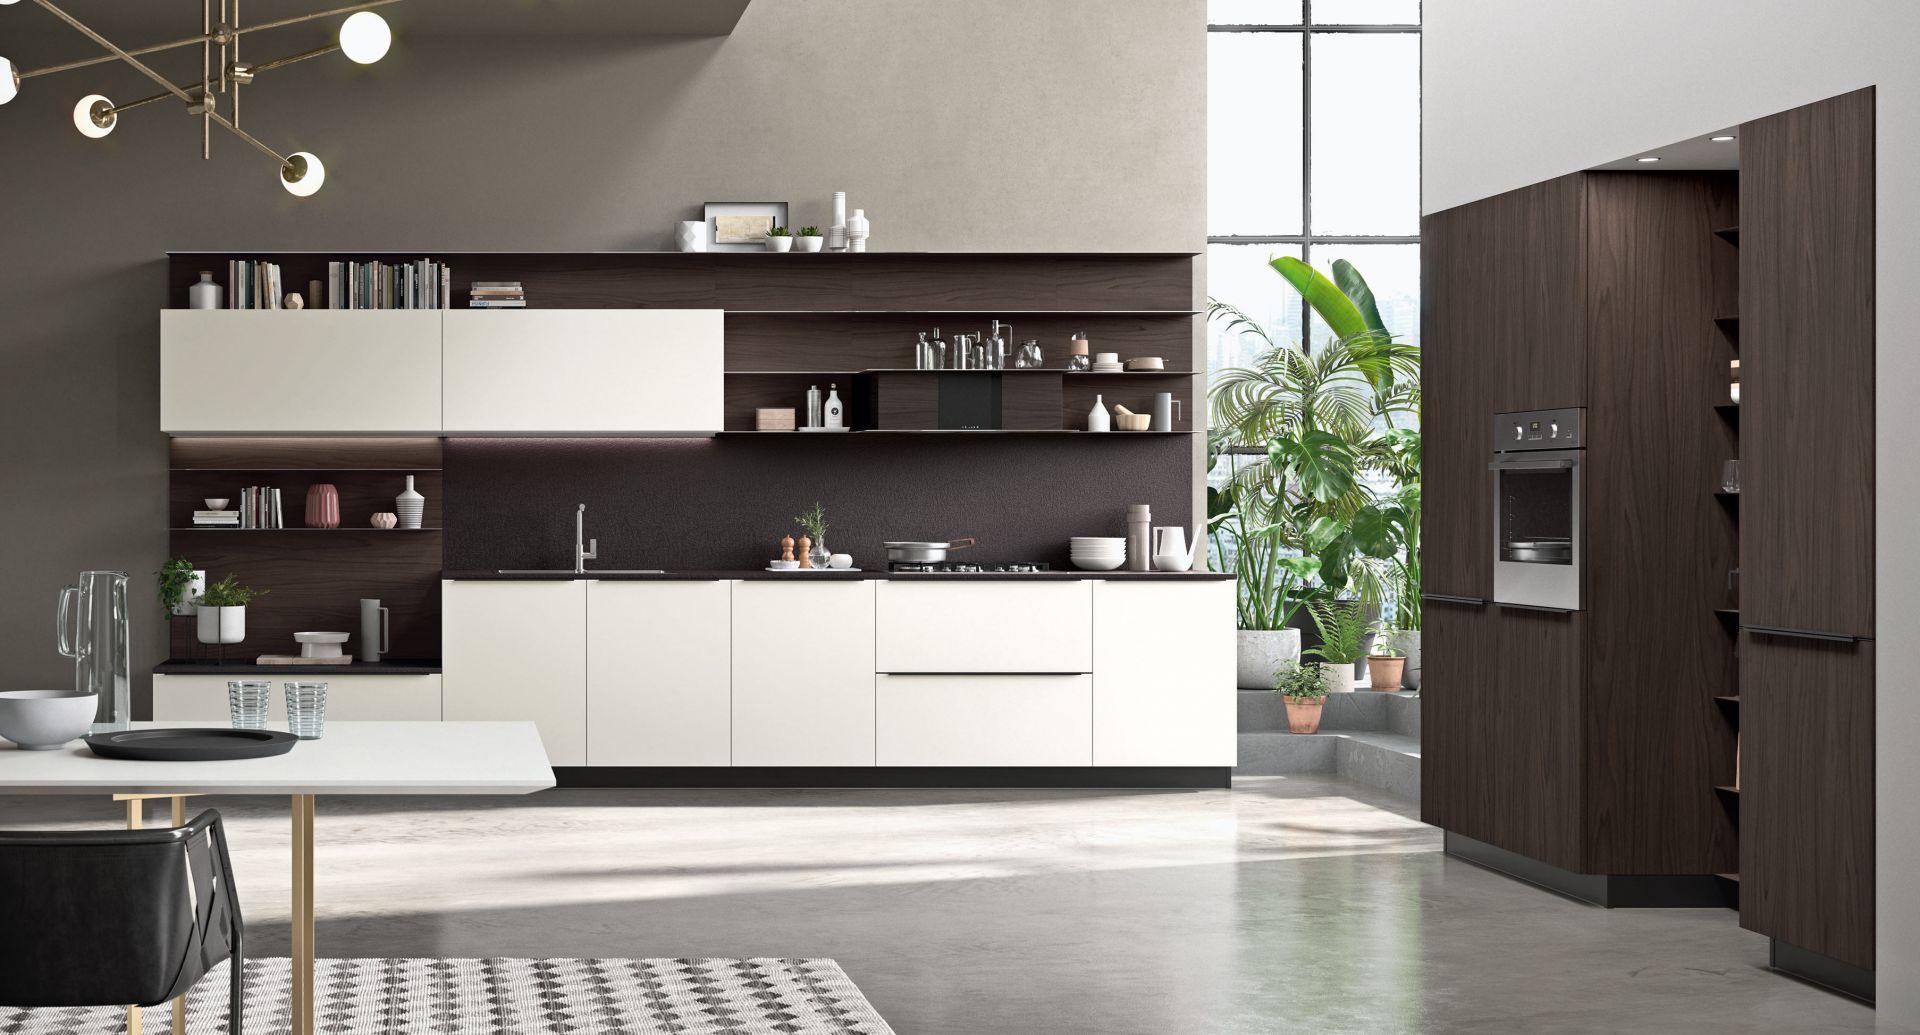 Cucine moderne Snaidero - Feel - foto 1